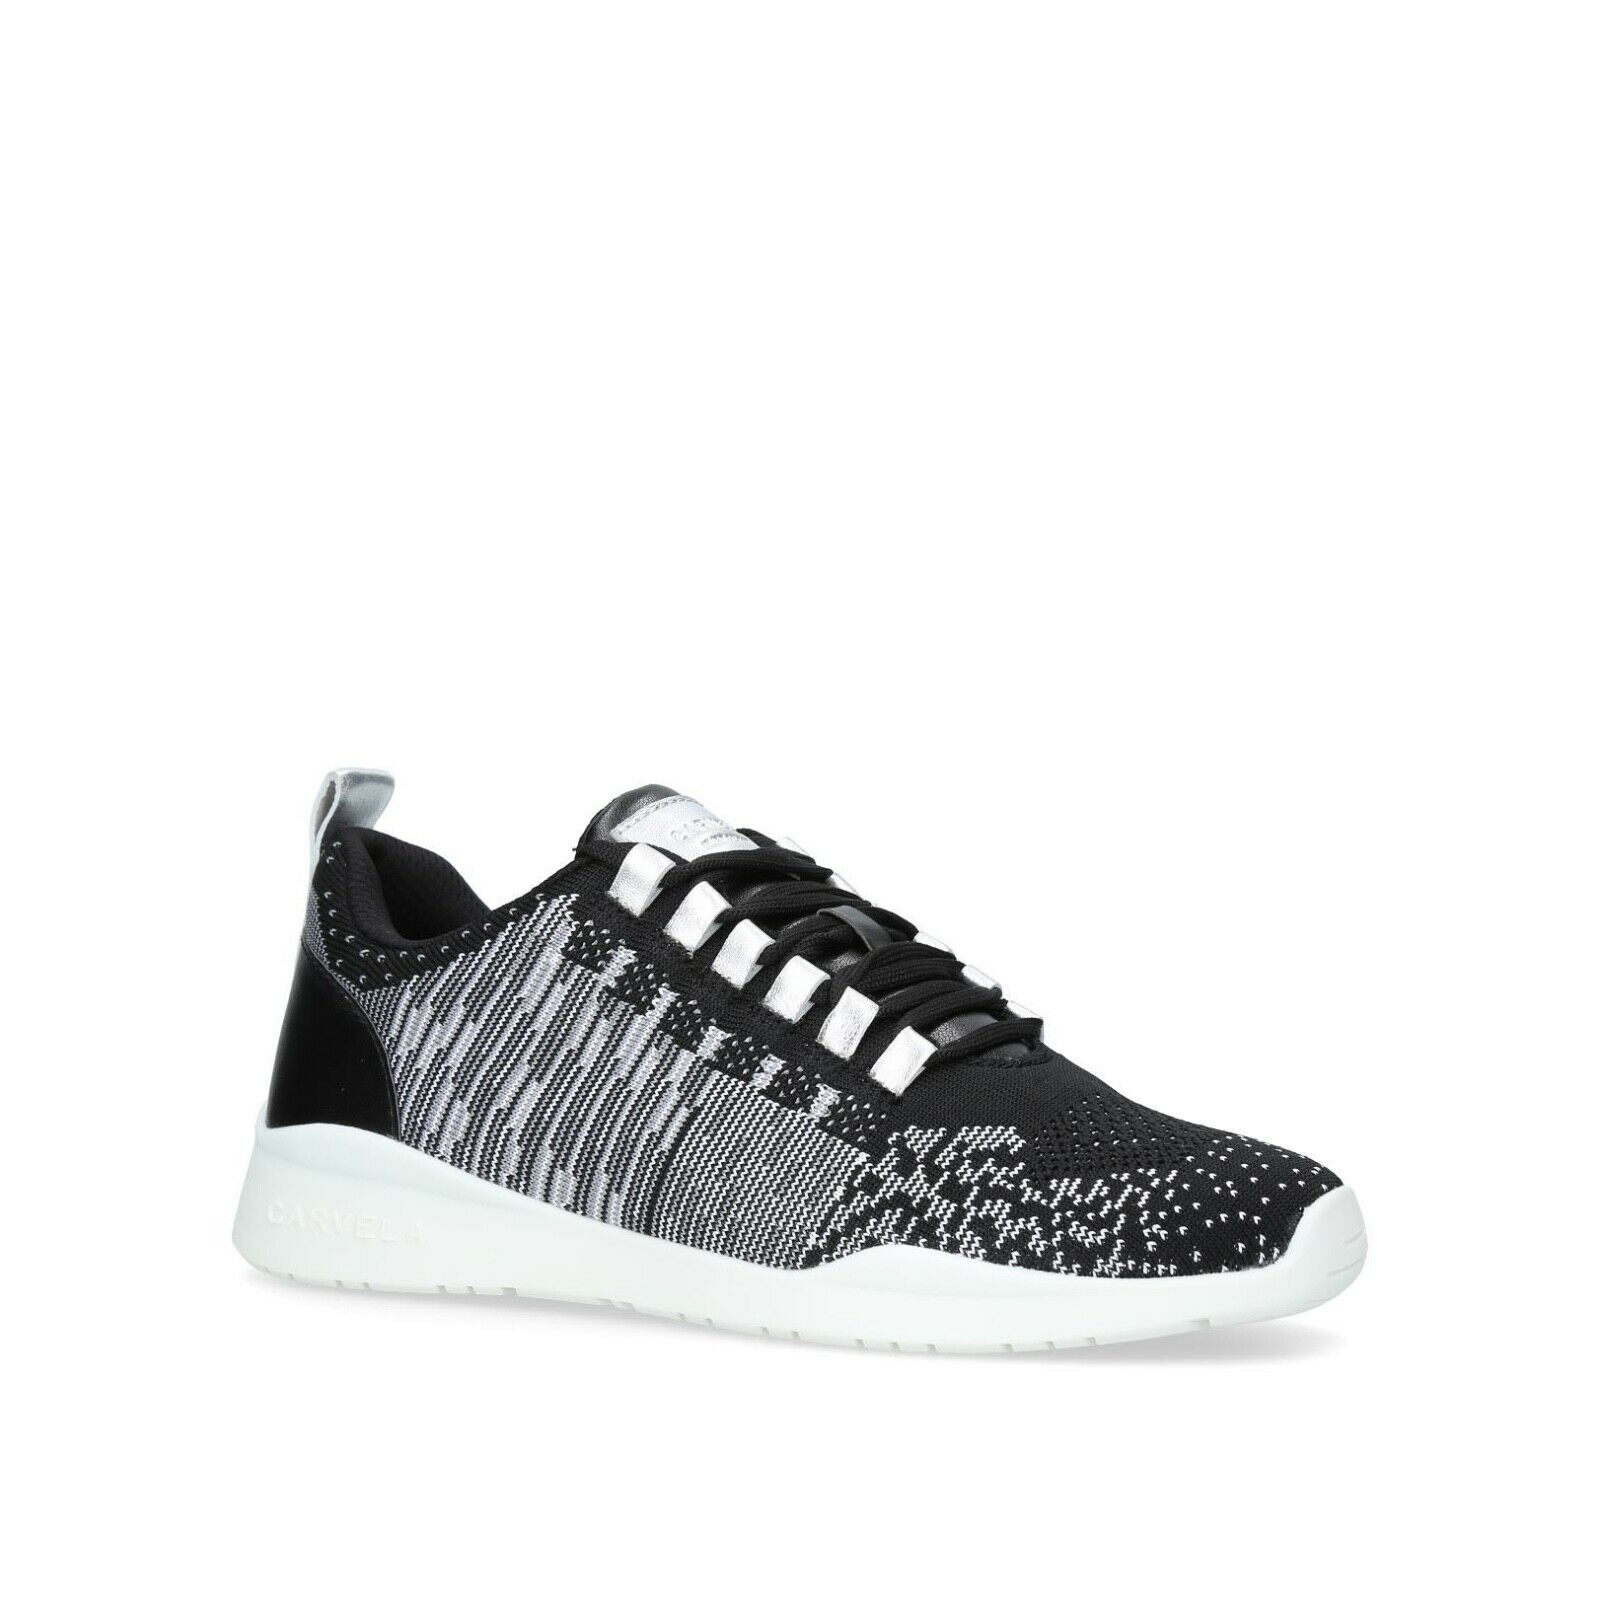 BNWT Hermoso botas Zapatos Azul Marino Talla 3 - 8UK 8UK 8UK PVP  calidad oficial